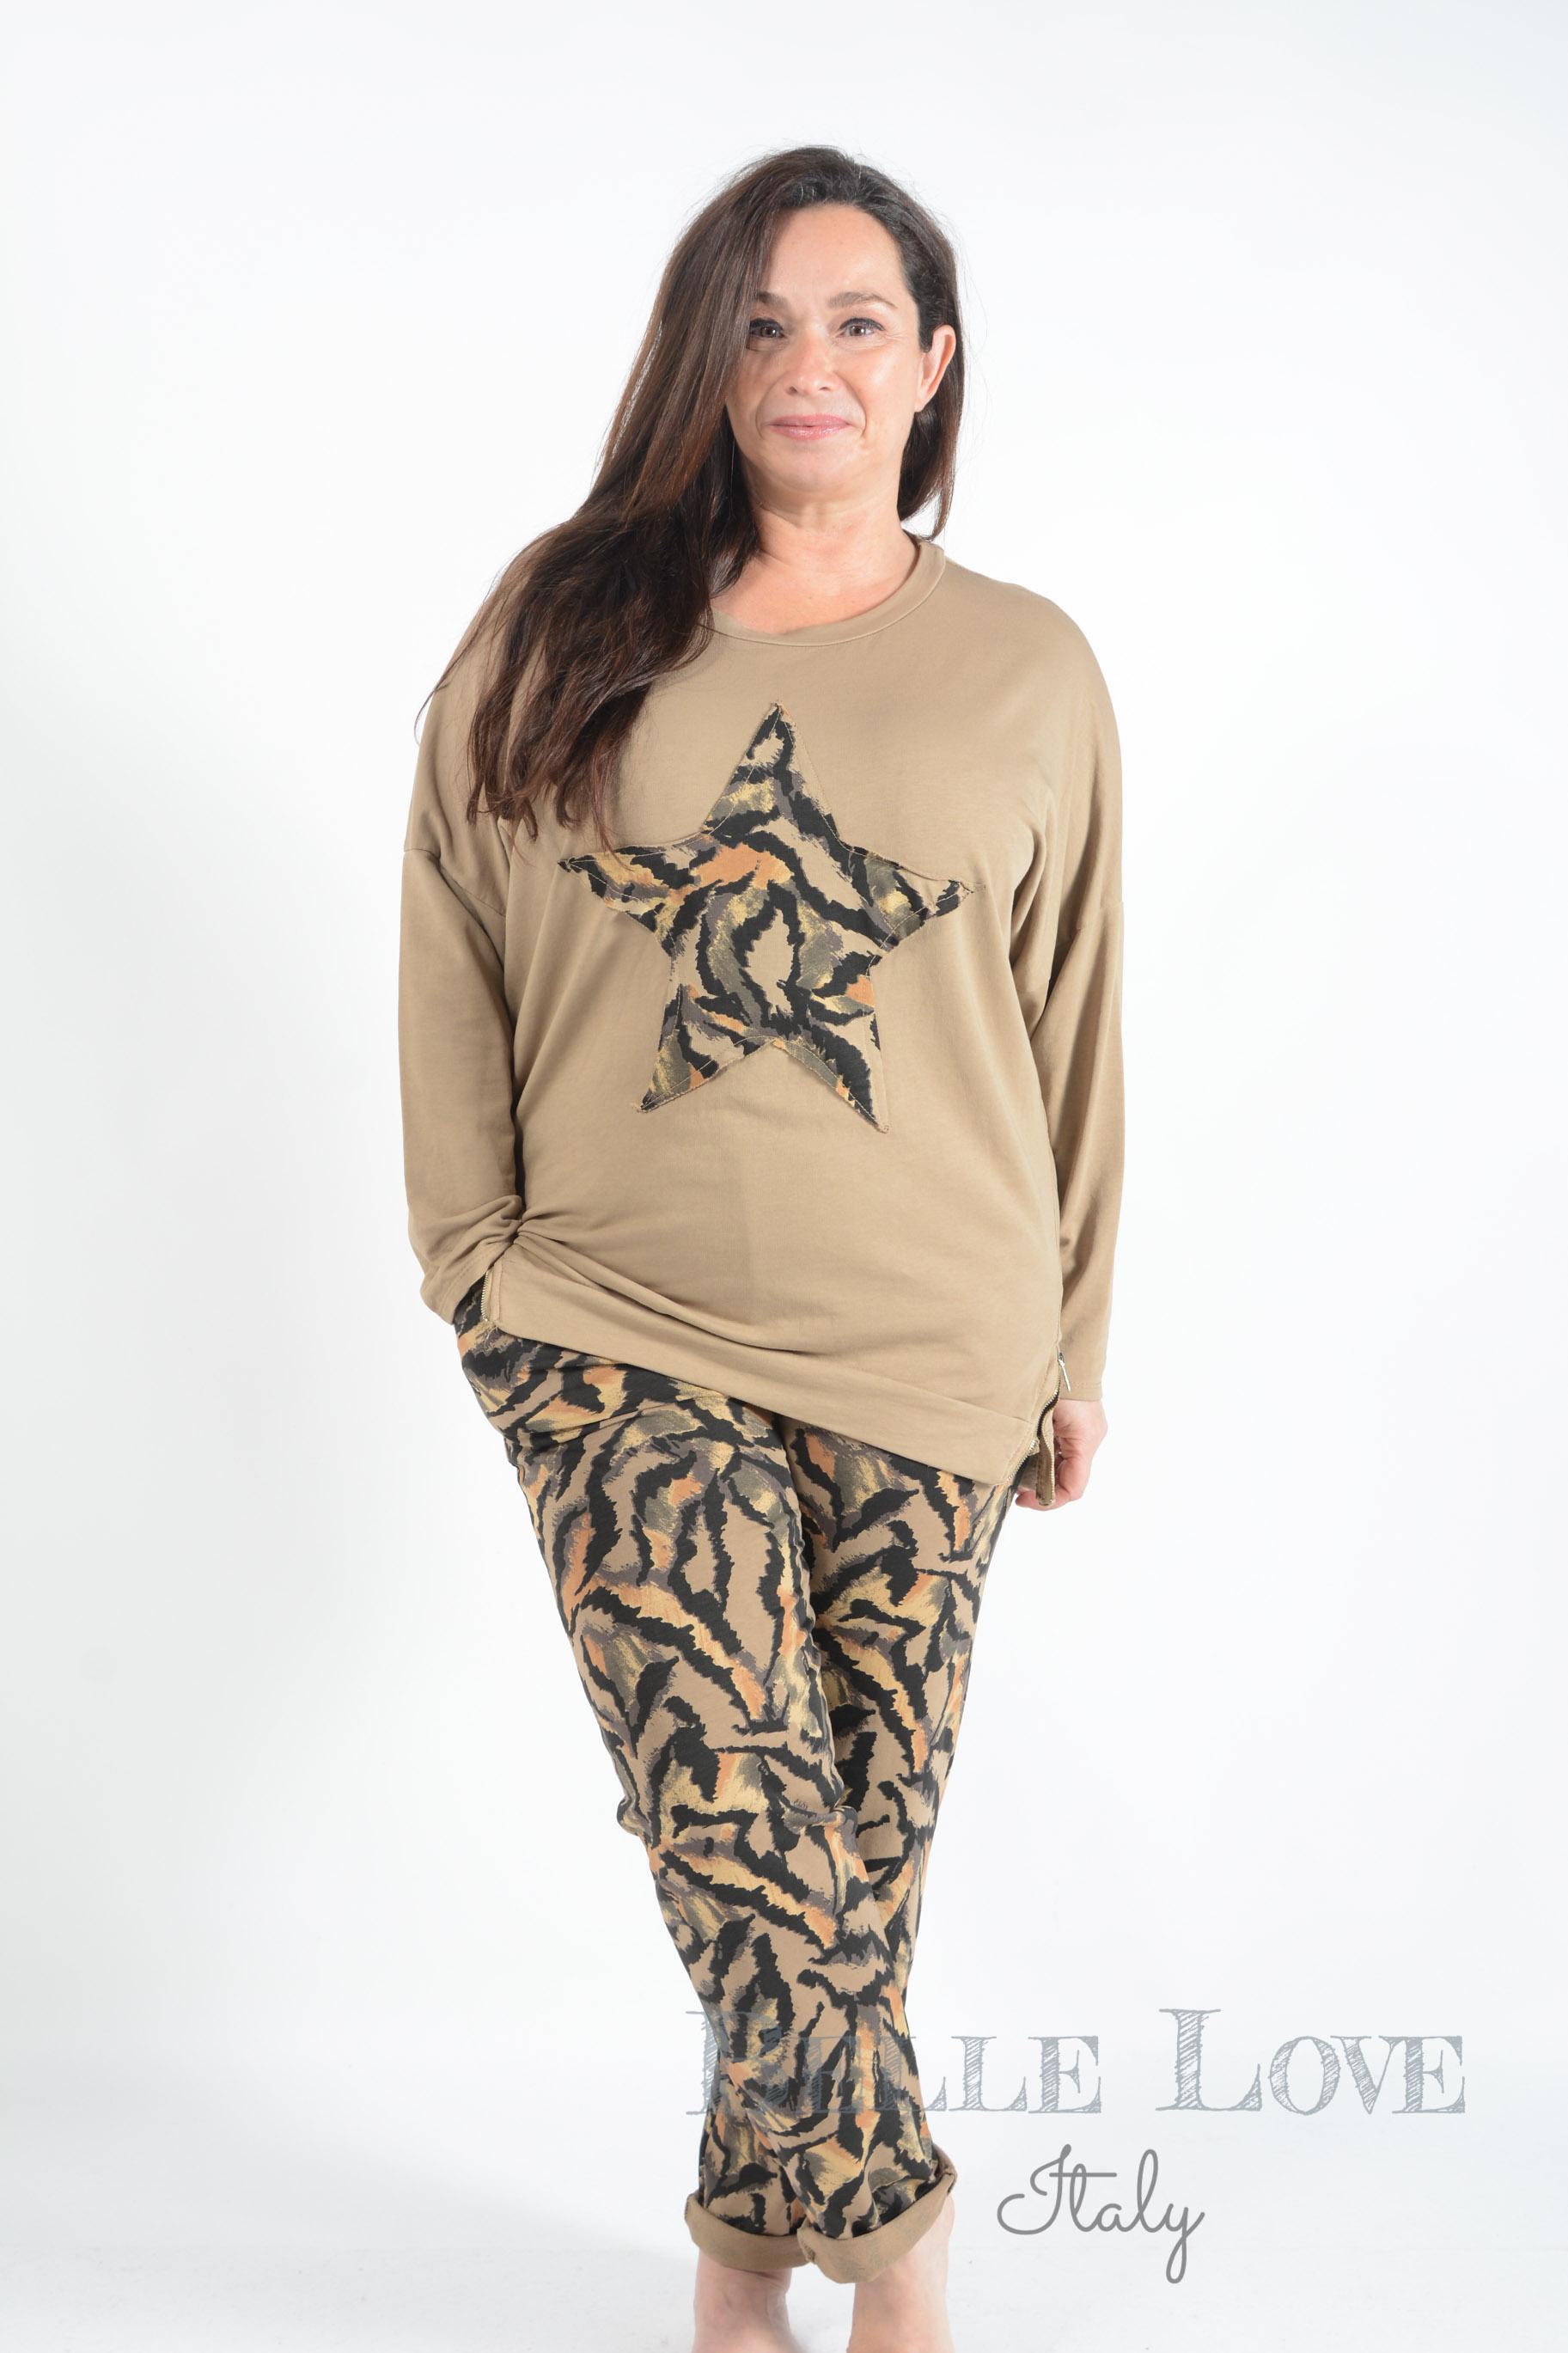 Belle Love Italy Tiger Star Loungewear Set